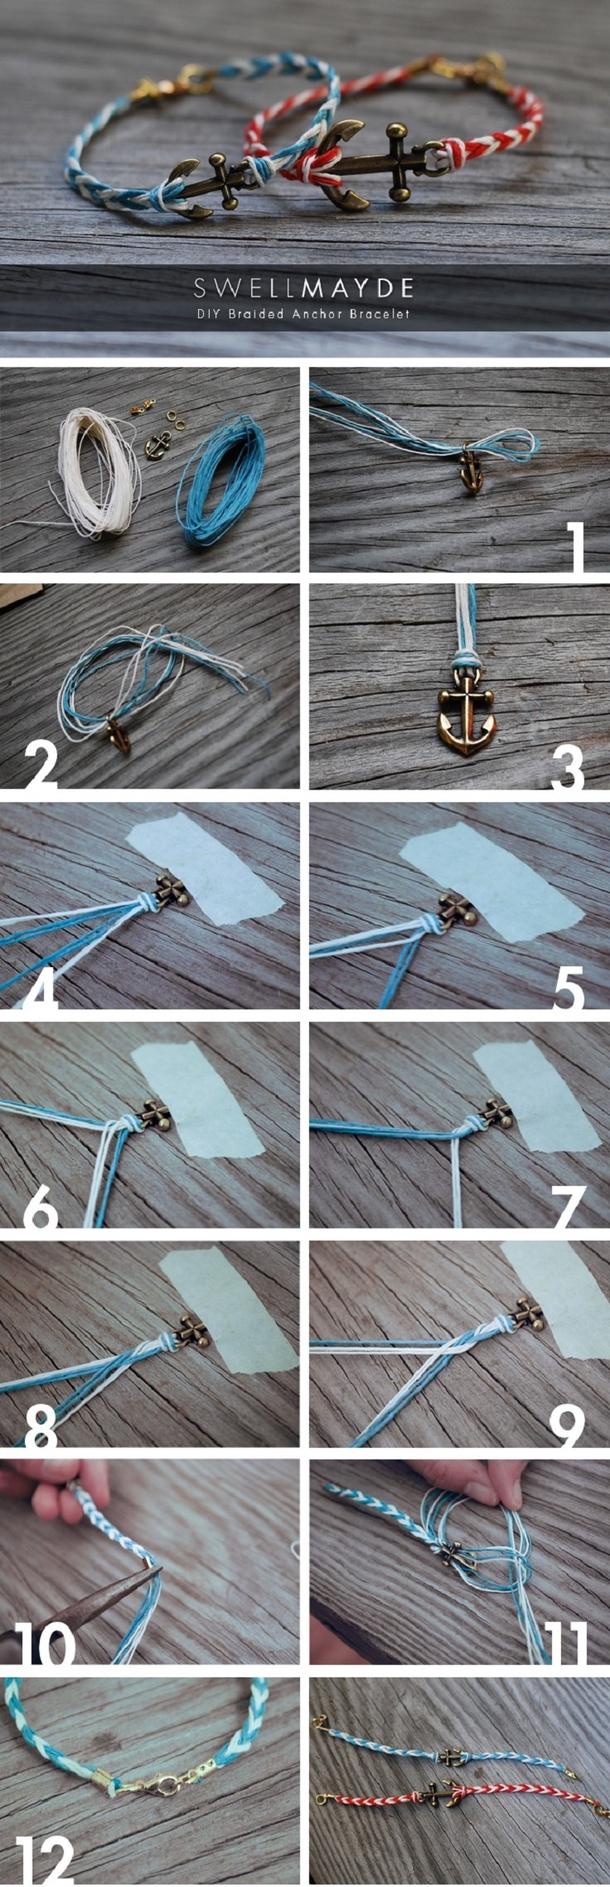 12 Super Simple Homemade Bracelet Tutorials7